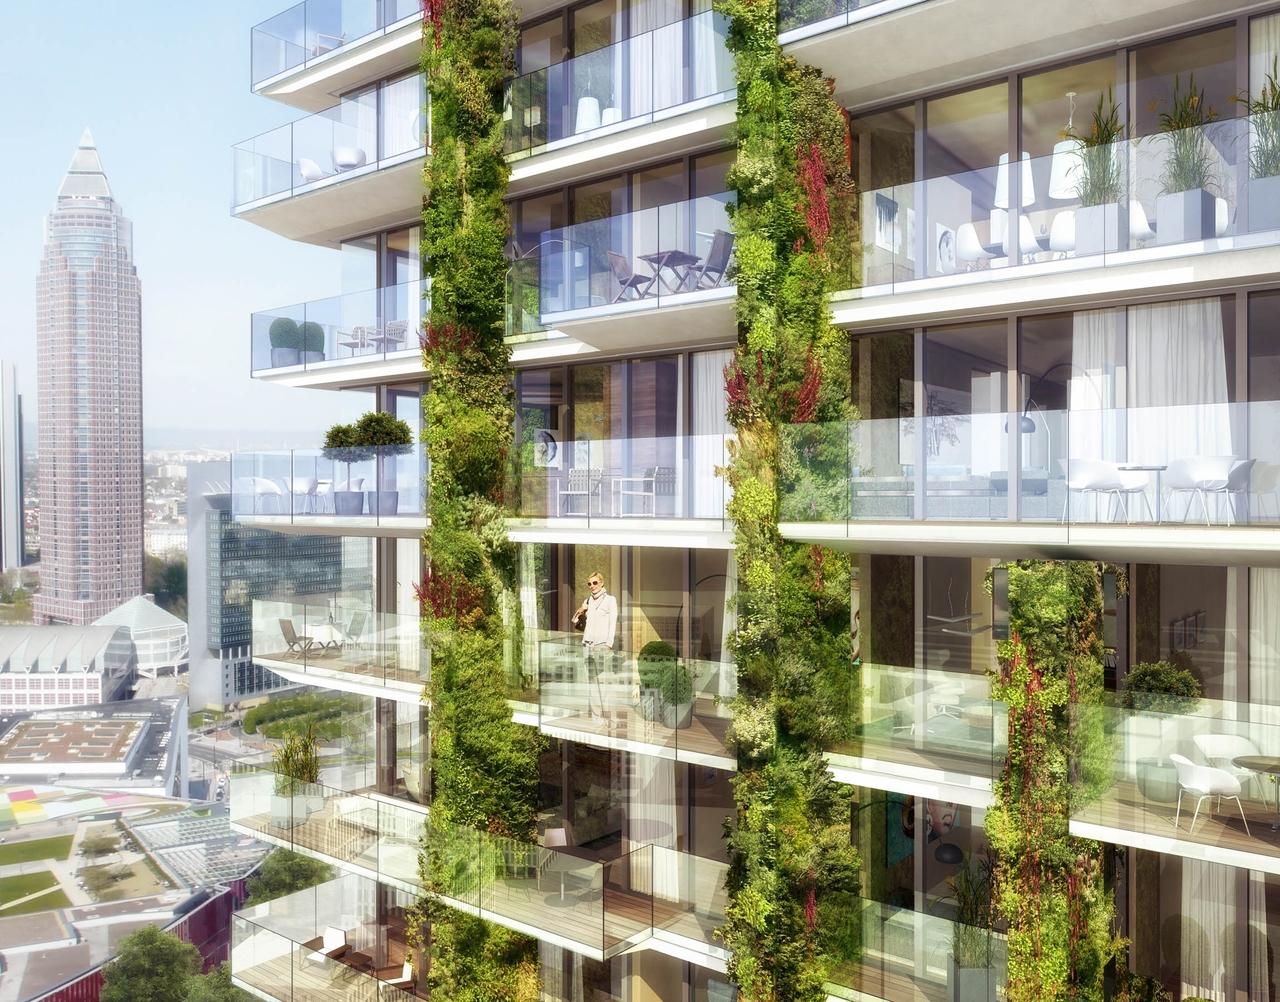 hochhauswelten frankfurt tower 90 g terplatz 90m. Black Bedroom Furniture Sets. Home Design Ideas